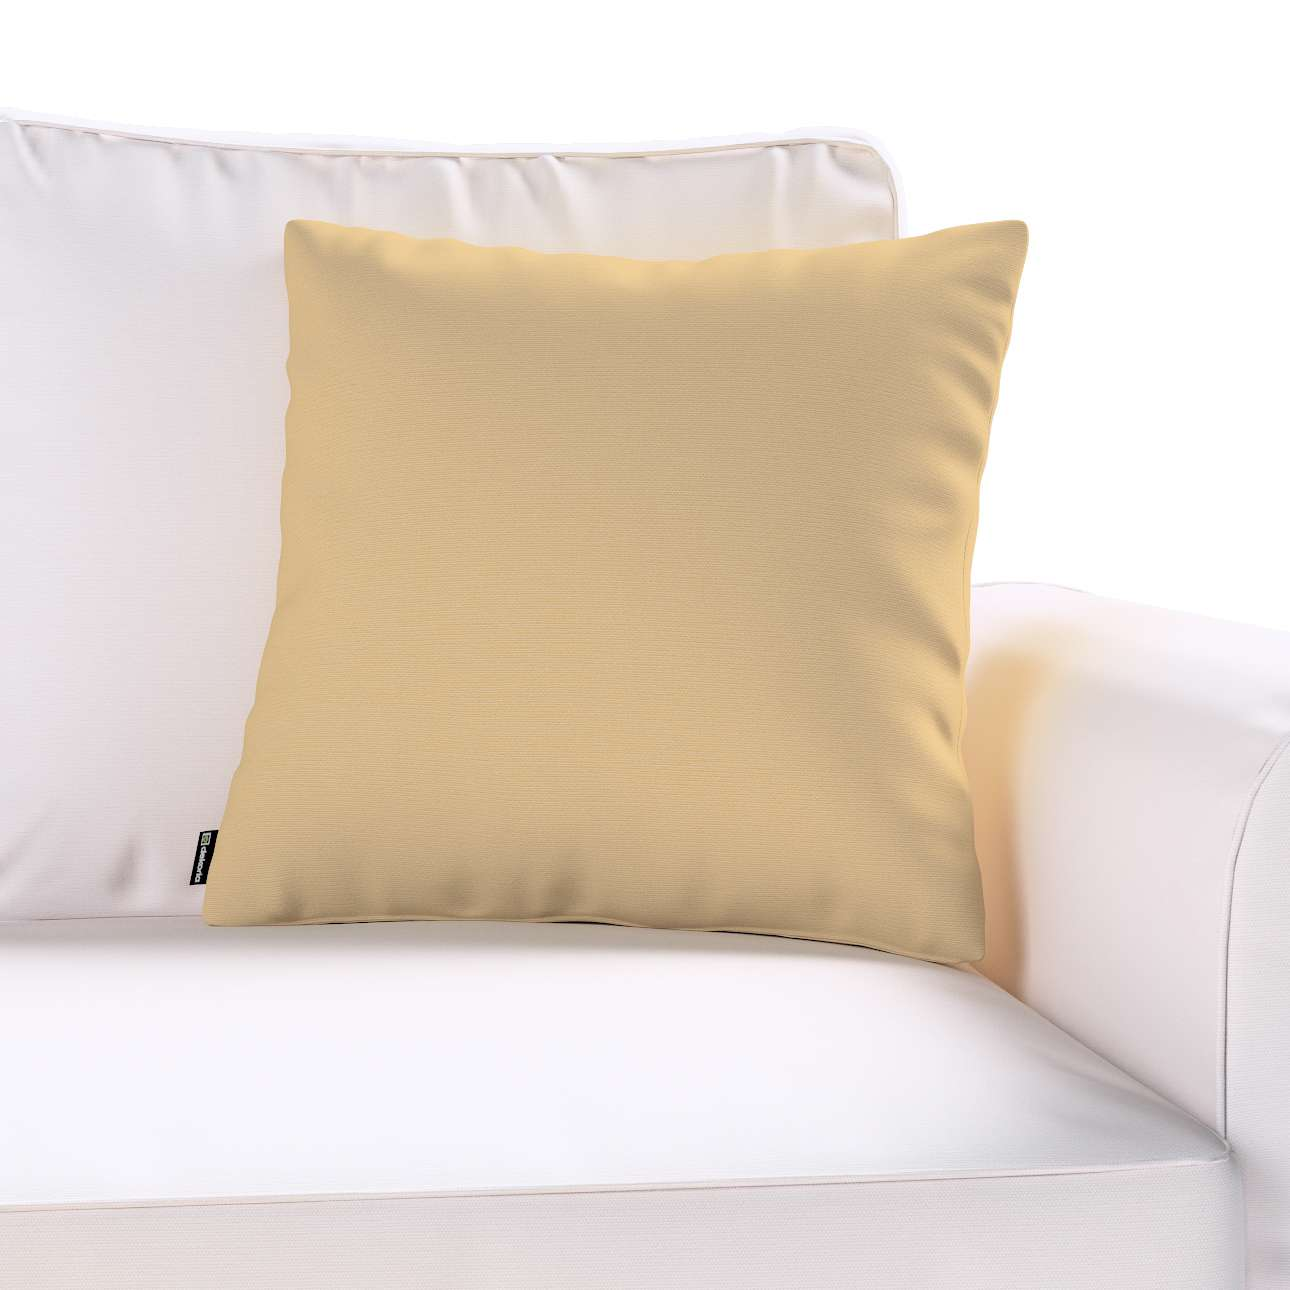 Kissenhülle Kinga von der Kollektion Cotton Panama, Stoff: 702-01